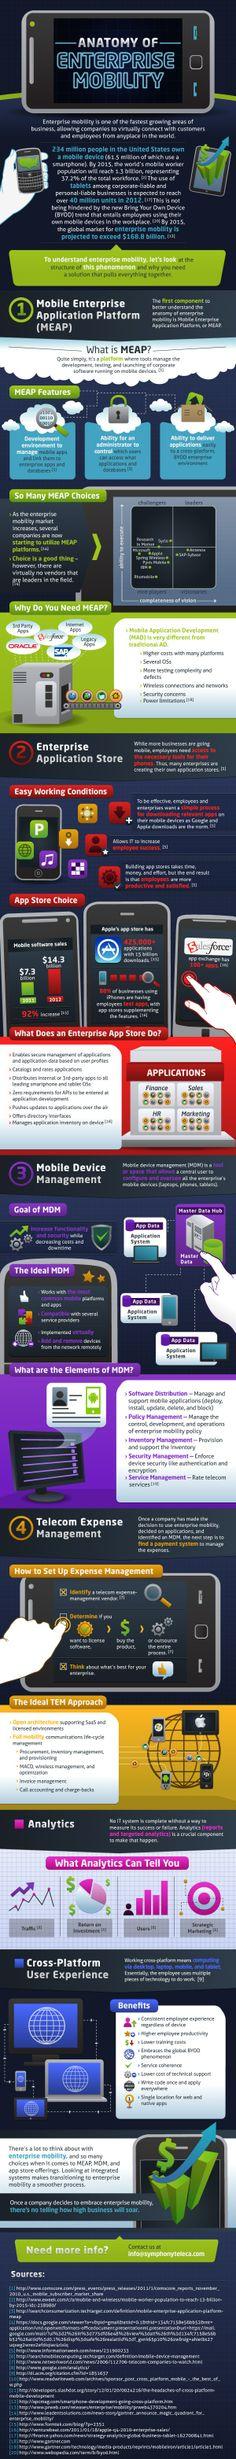 Anatomy Of Enterprise Mobility. #mobility #mobile #enterprise